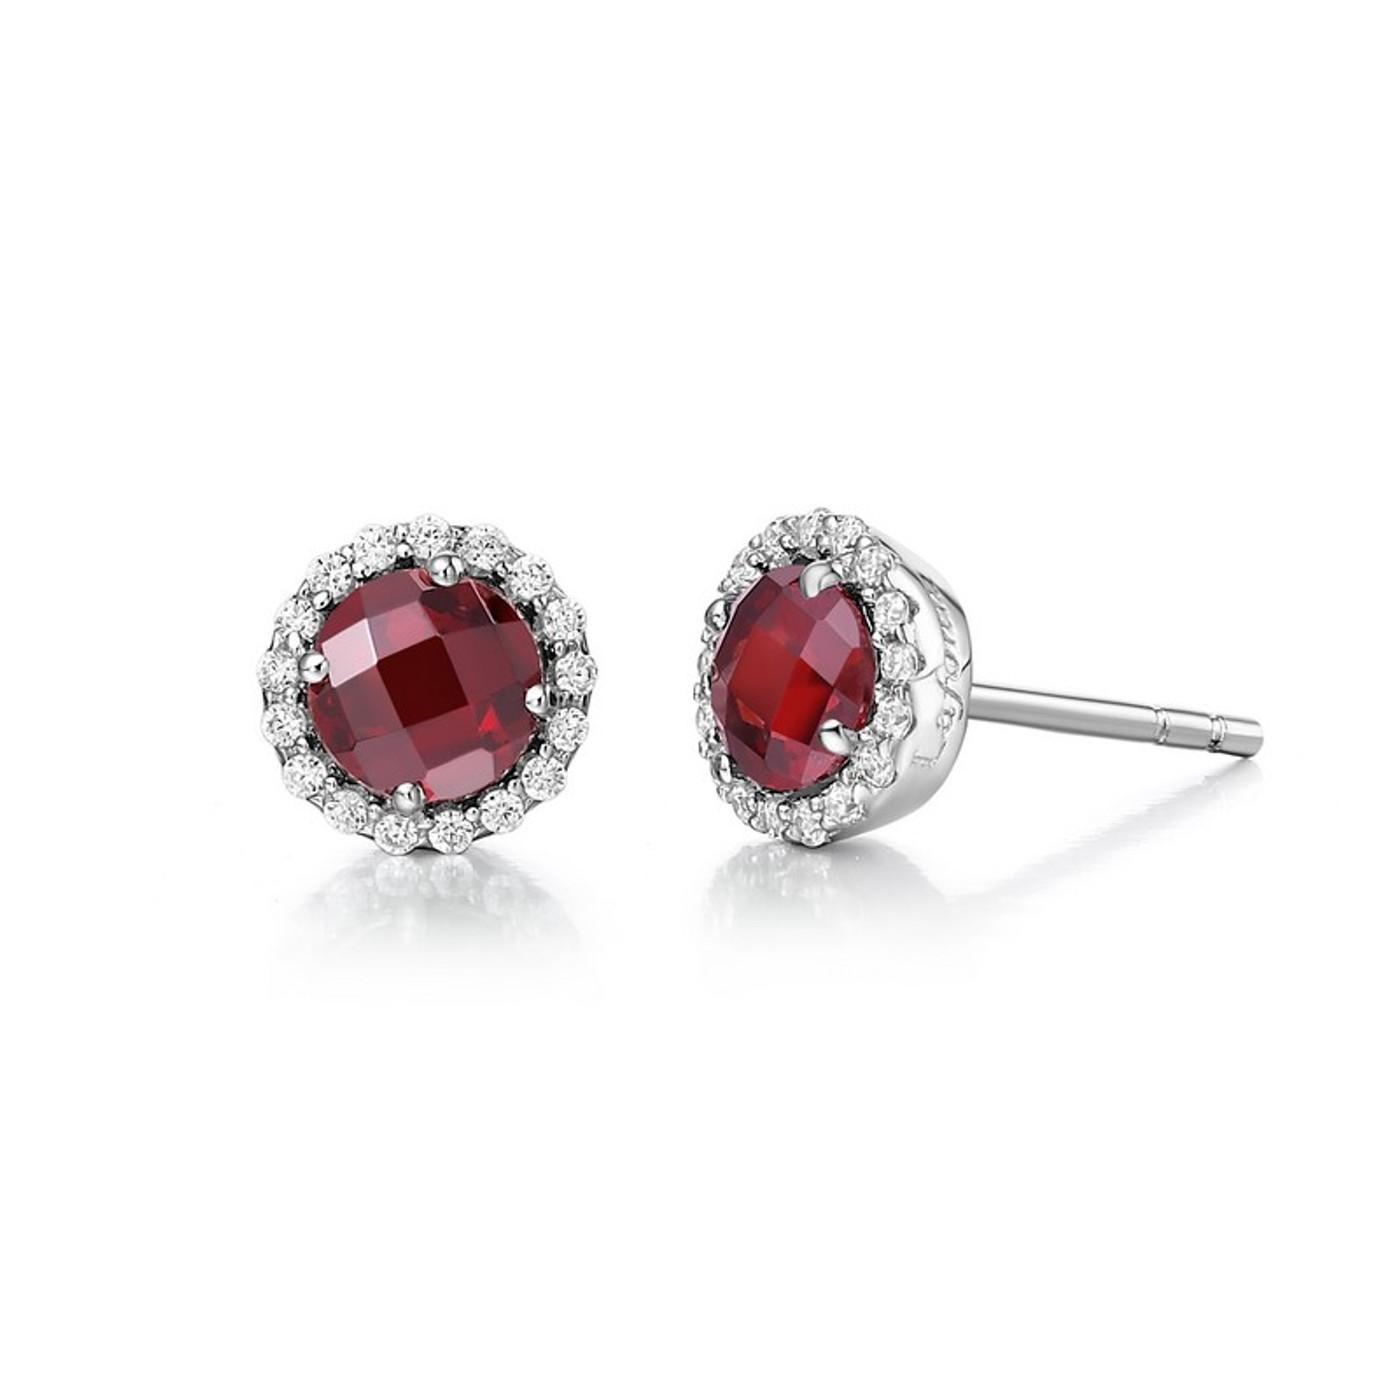 Sterling Silver Garnet & Simulated Diamond Stud Earrings